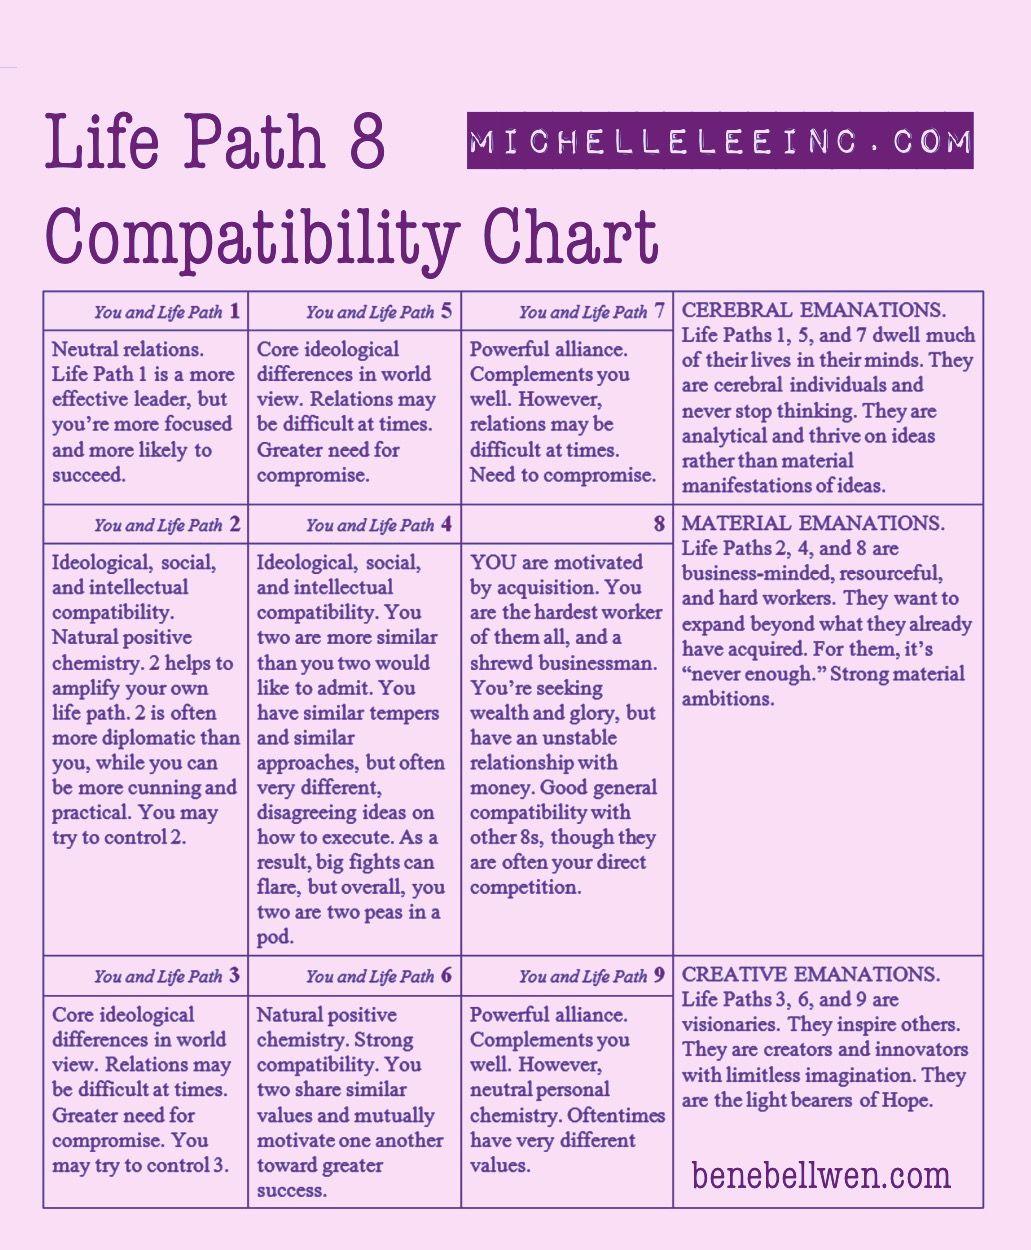 Numerology lifepath 8 love compatibility chart numerology numerology lifepath 8 love compatibility chart nvjuhfo Choice Image